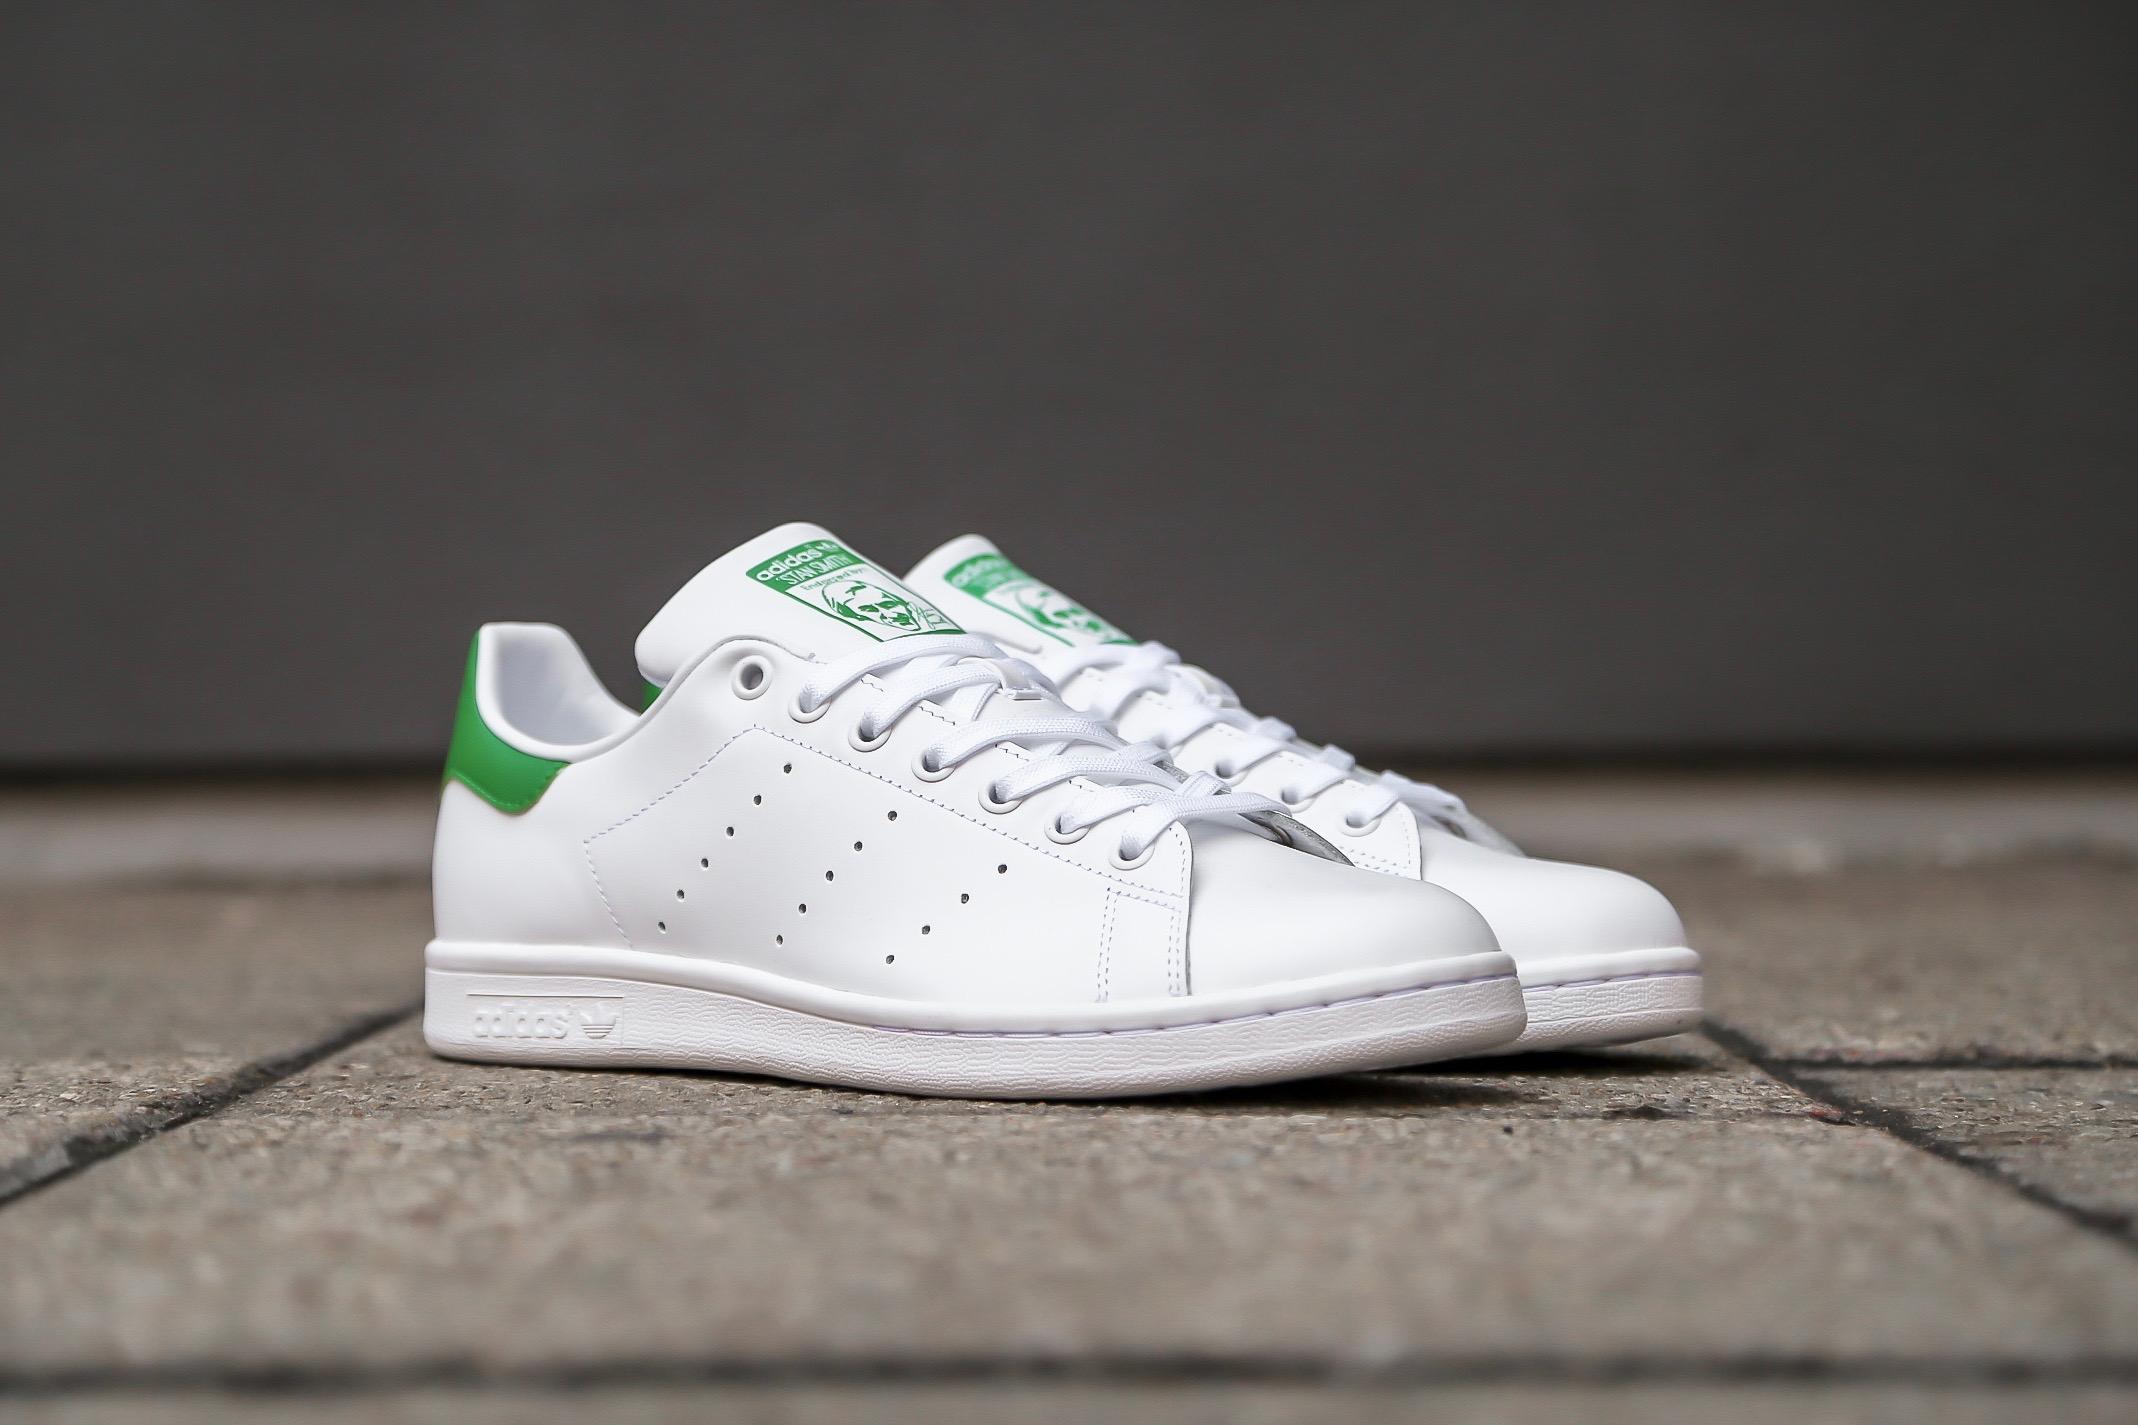 7a974e944 adidas Originals Stan Smith – Ftwr White / Core White / Green – STASP